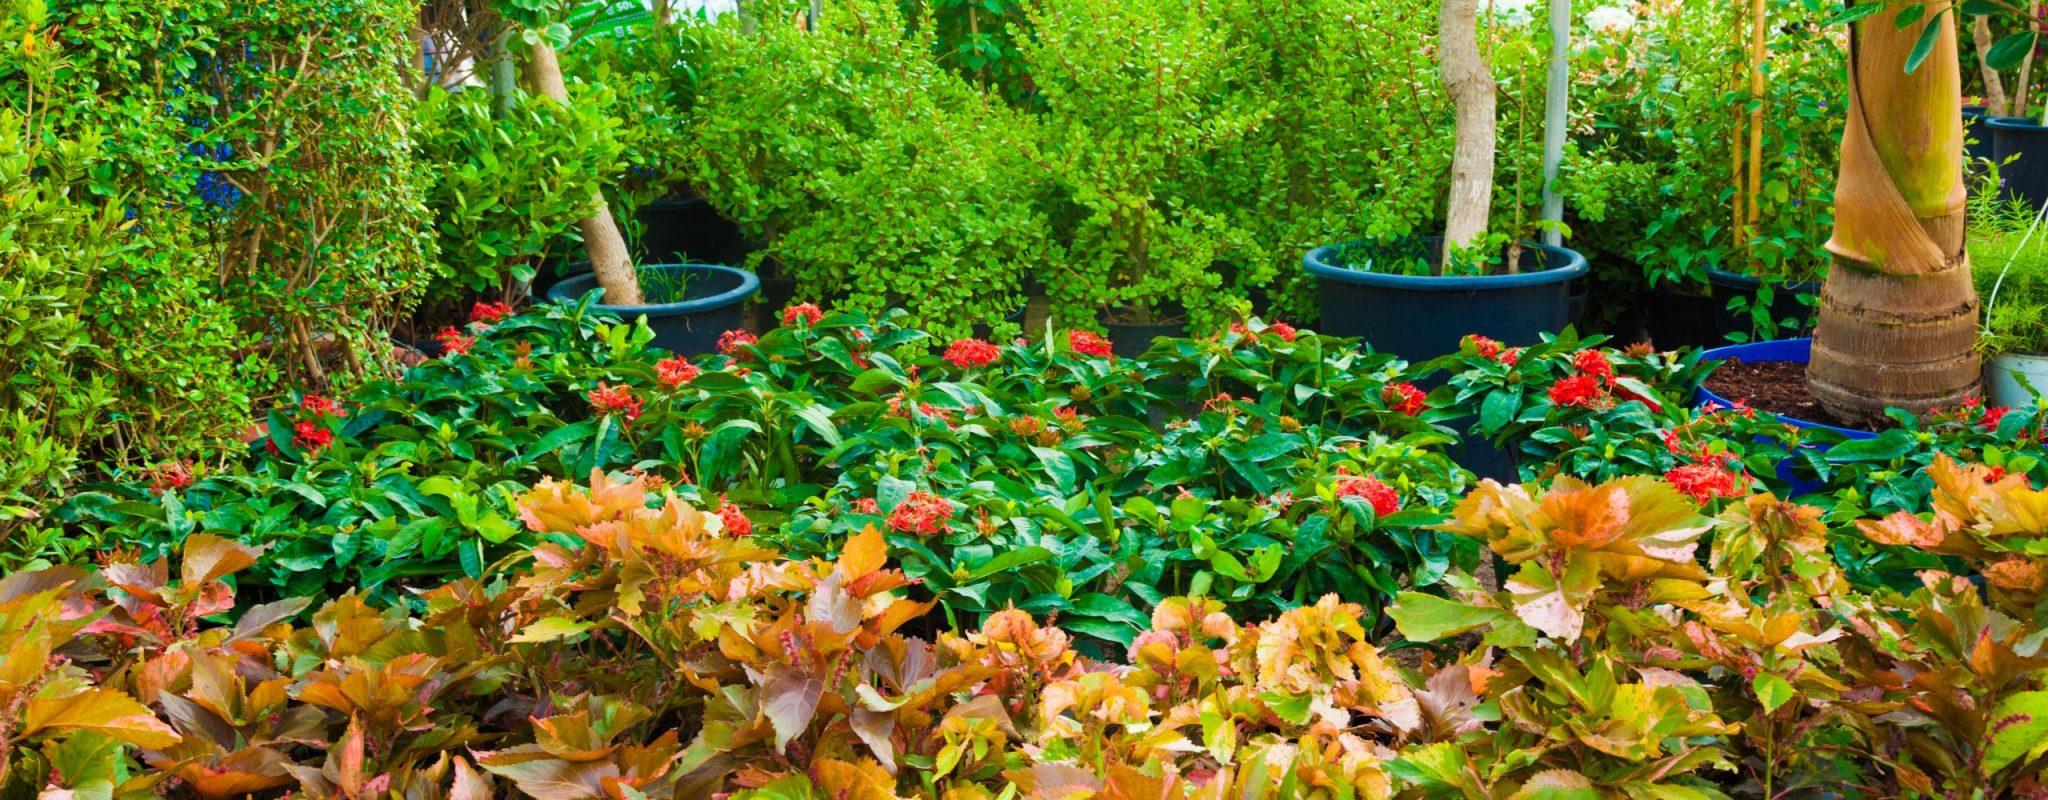 Oakland Agriculture Dubai plants pots nursery